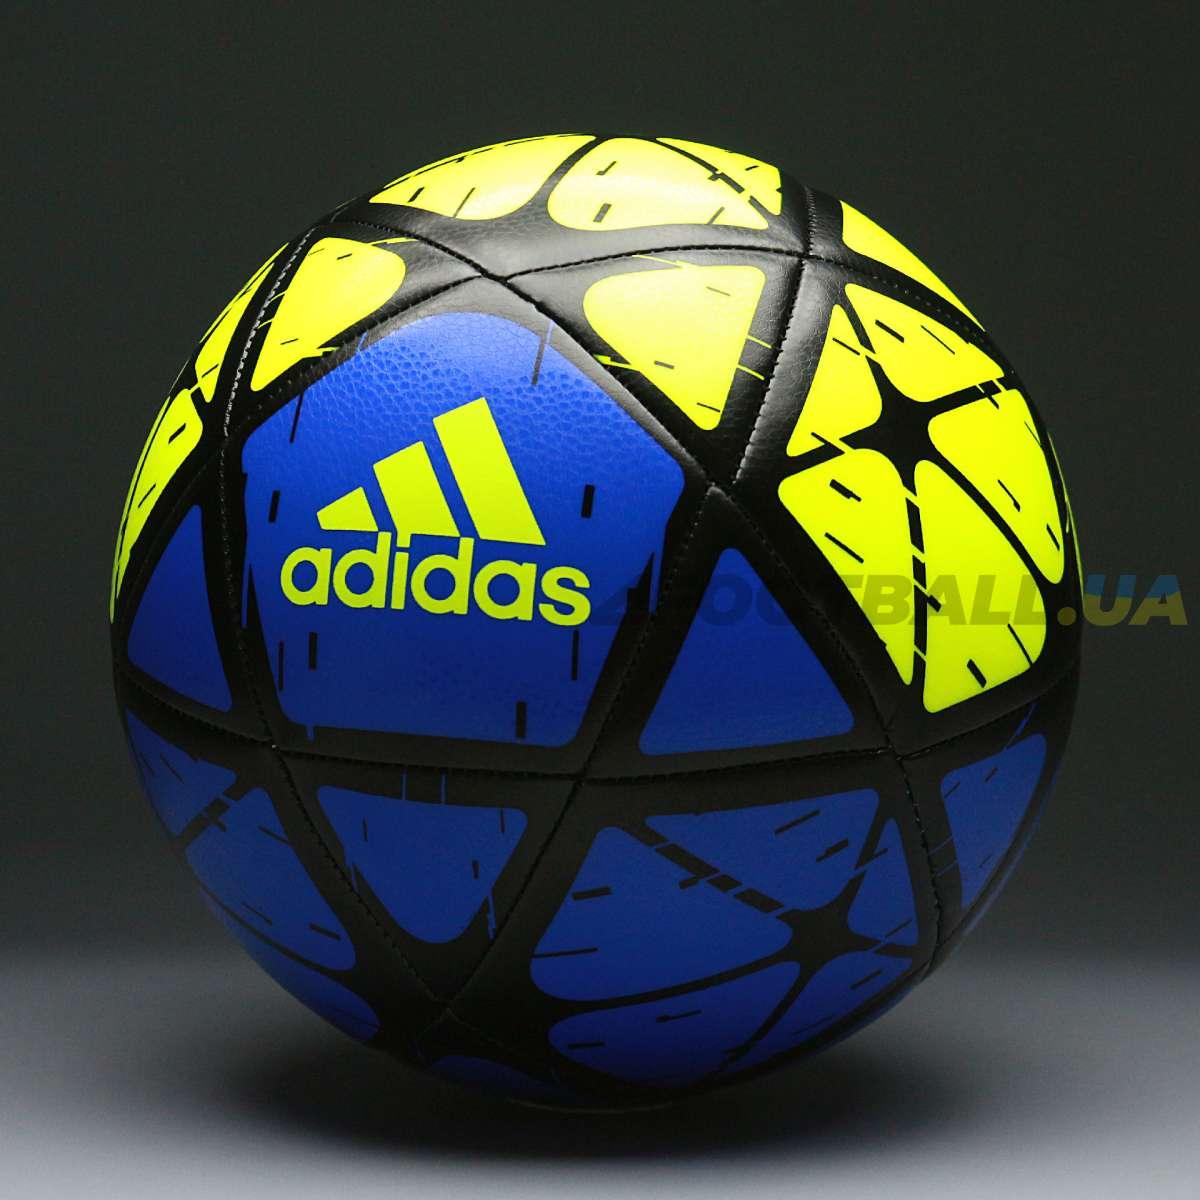 ... Футбольный Мяч Adidas Glider CW4170 №5 4 ... 26b4cb668e7e5